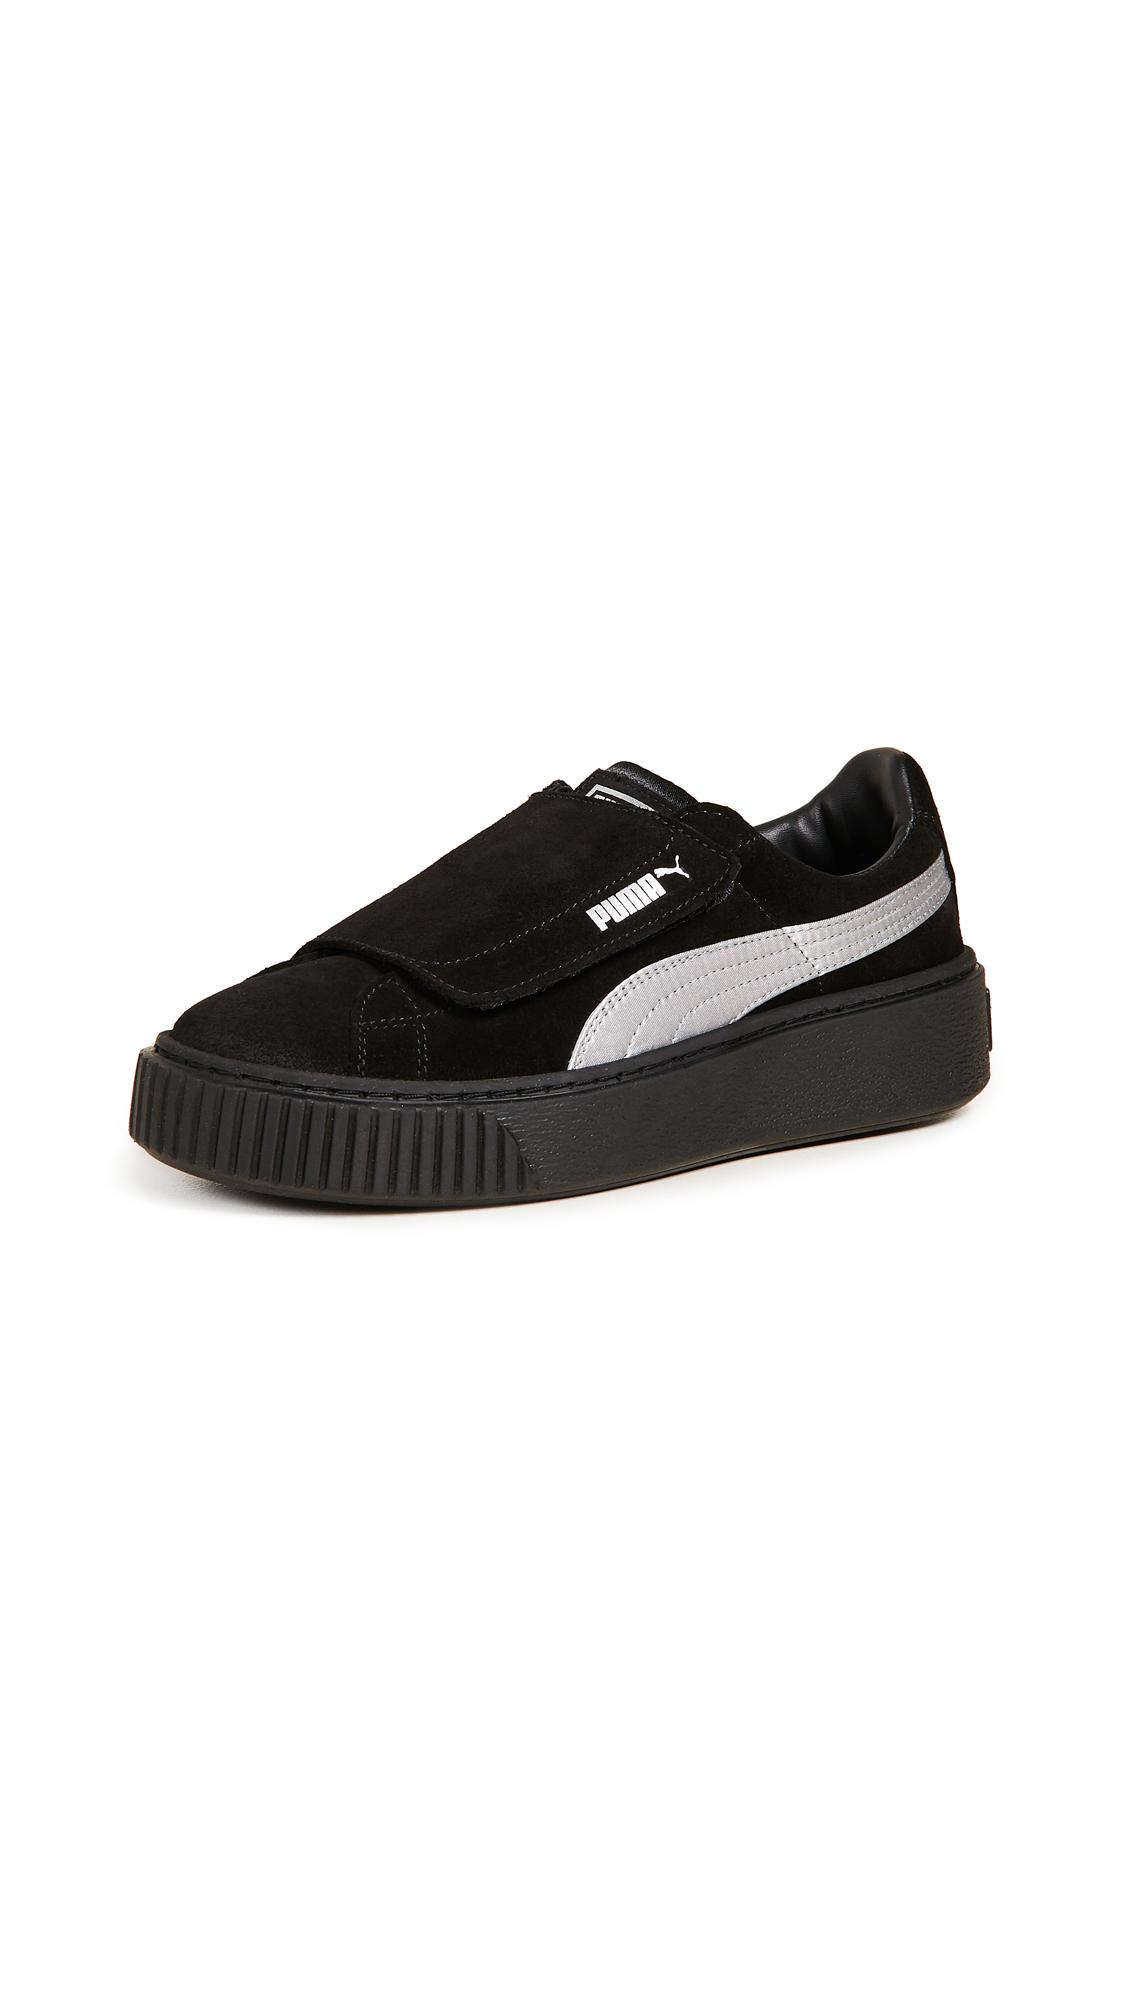 PUMA Platform Strap Satin EP Sneakers - Puma Black/Puma Black